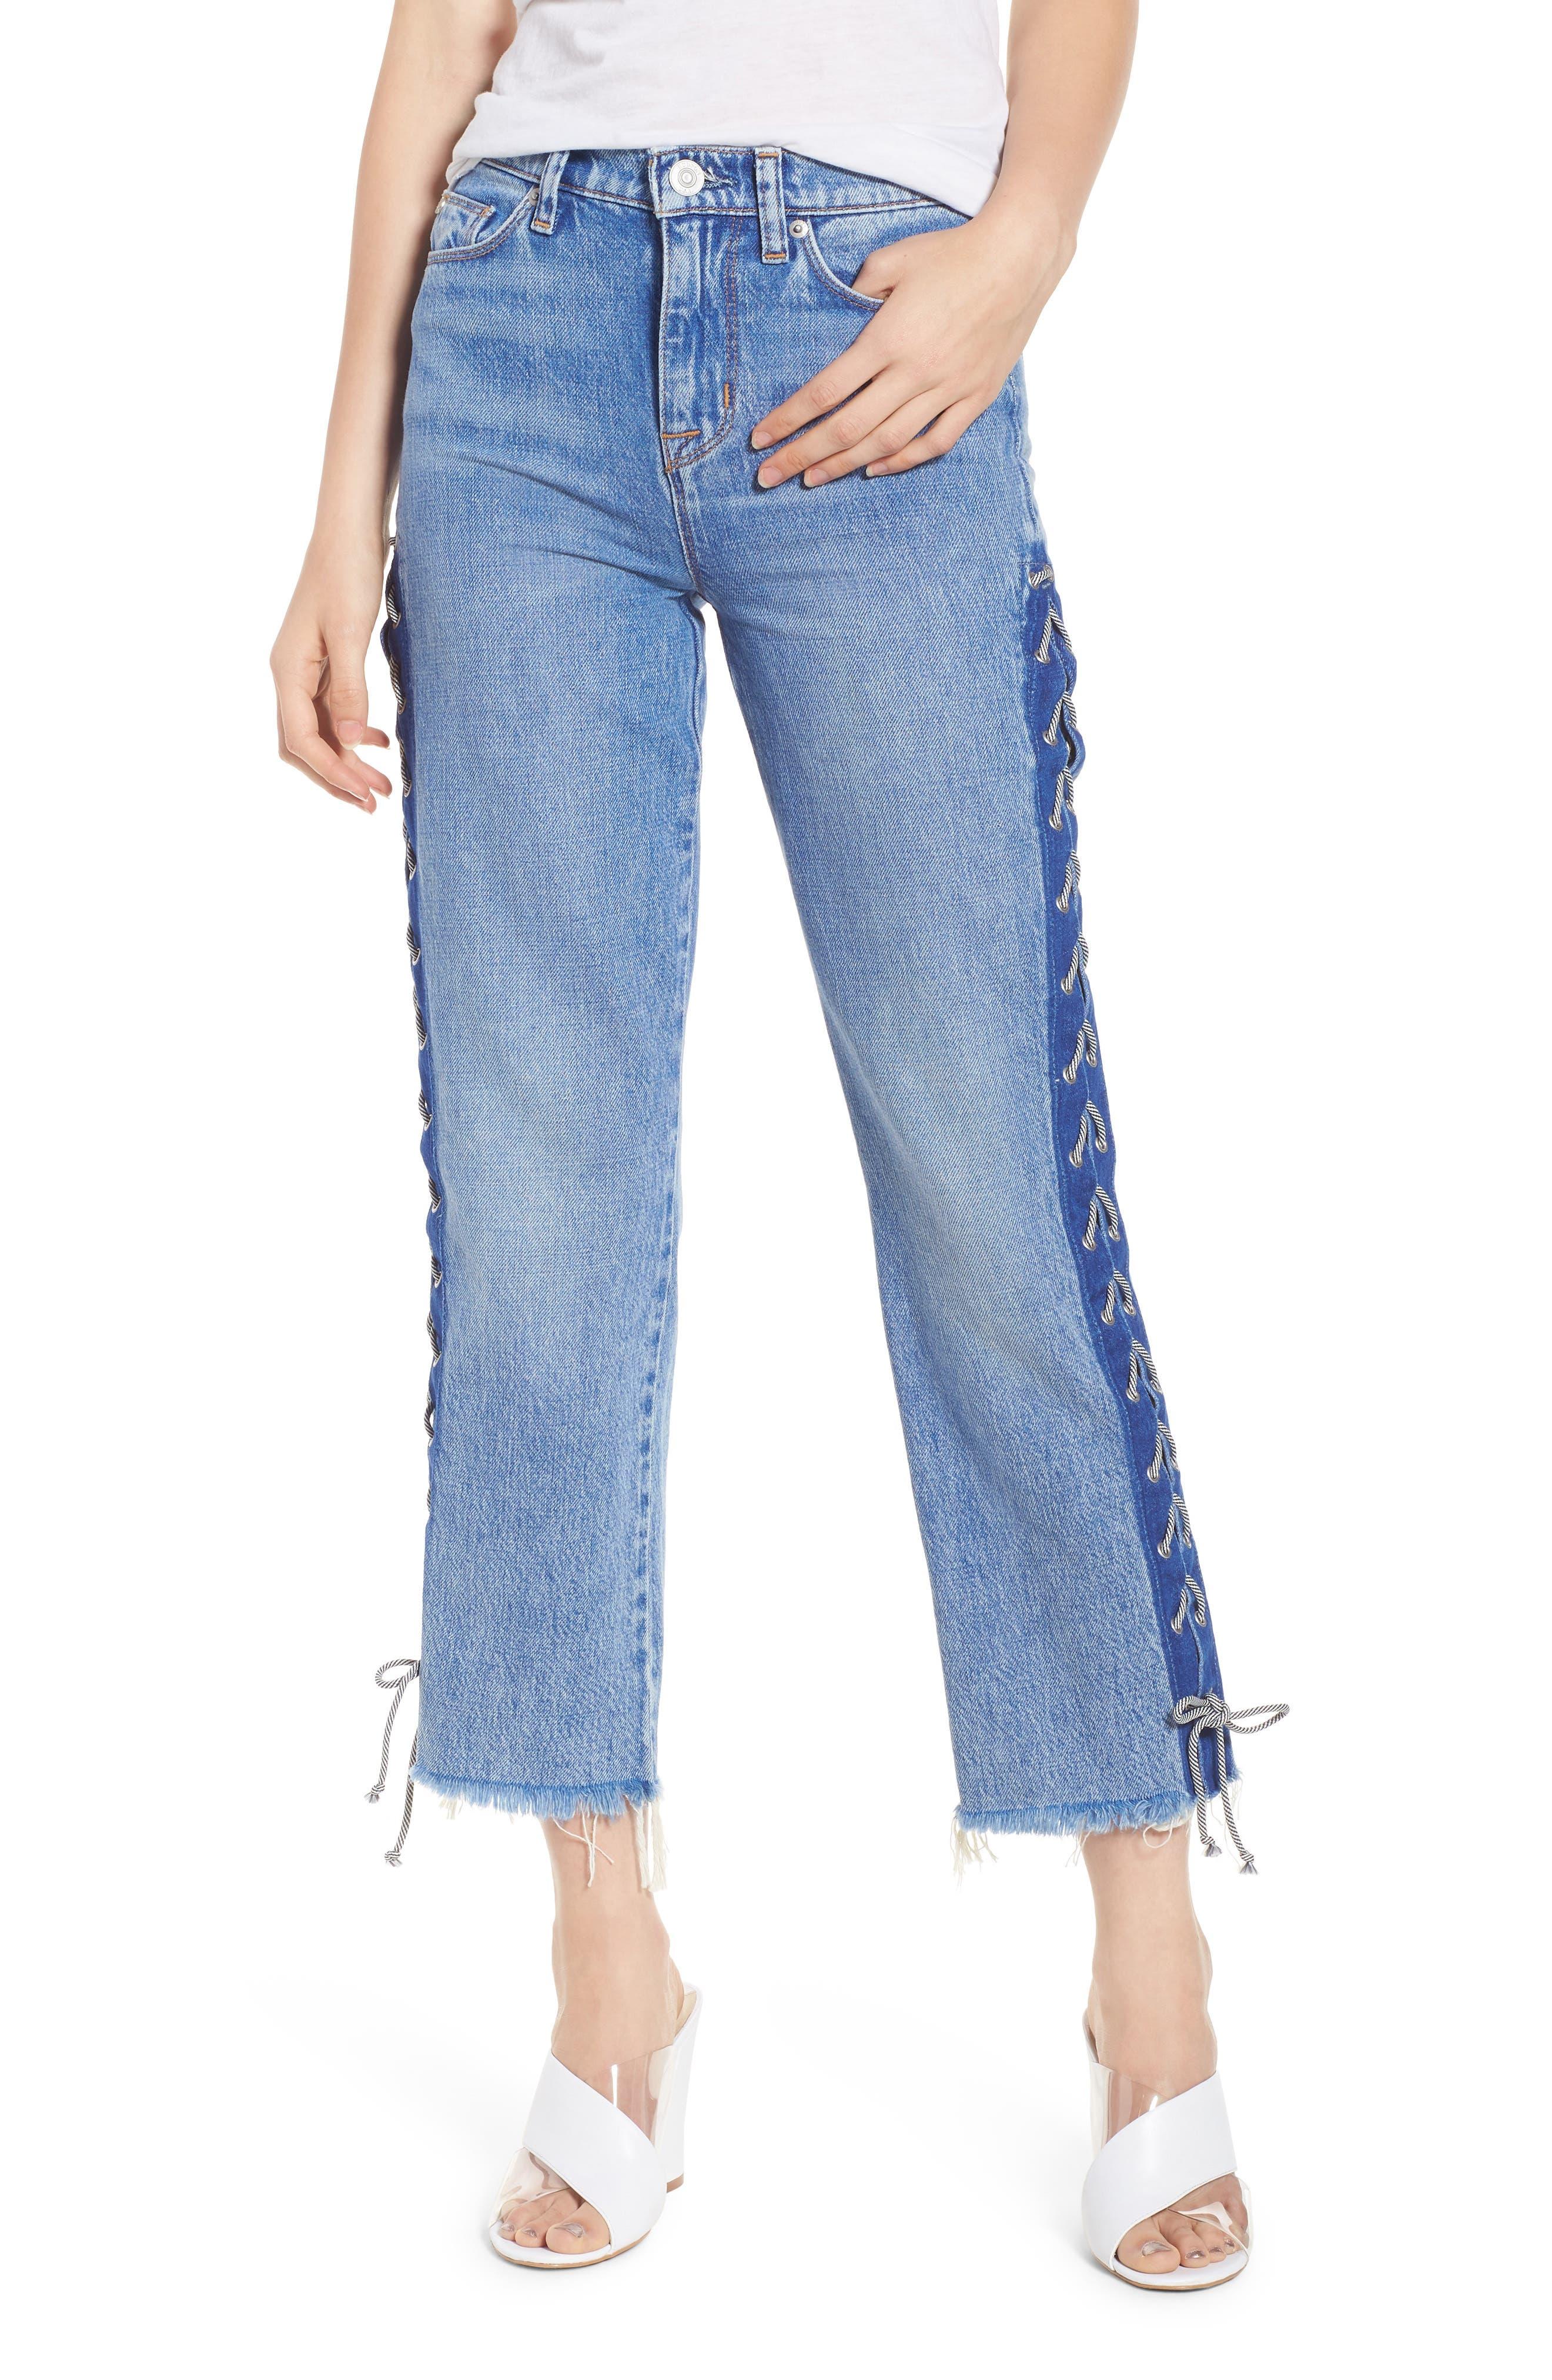 Zoeey High Waist Crop Straight Leg Jeans,                             Main thumbnail 1, color,                             460